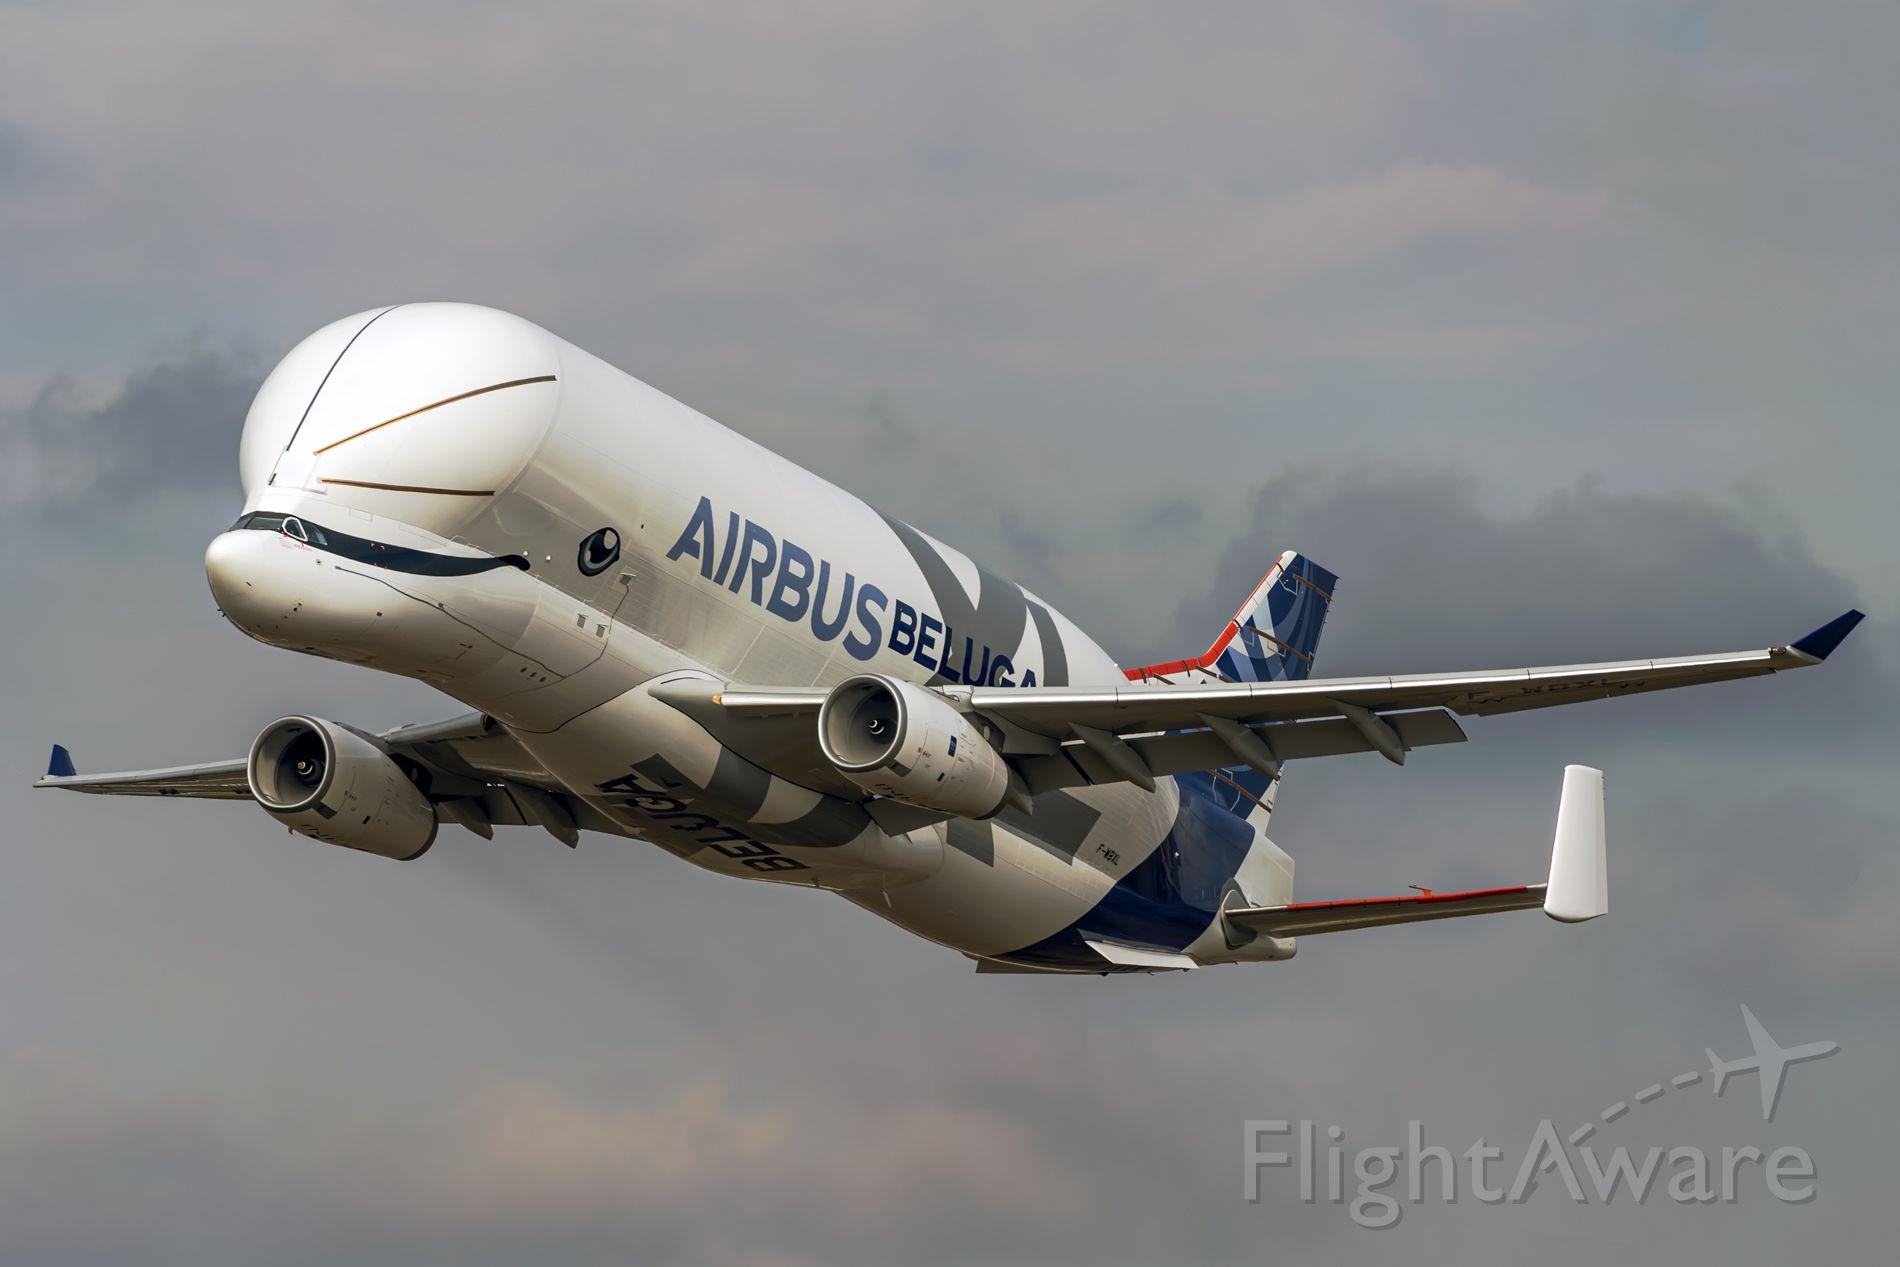 Airbus A330-300 (F-WBXL)